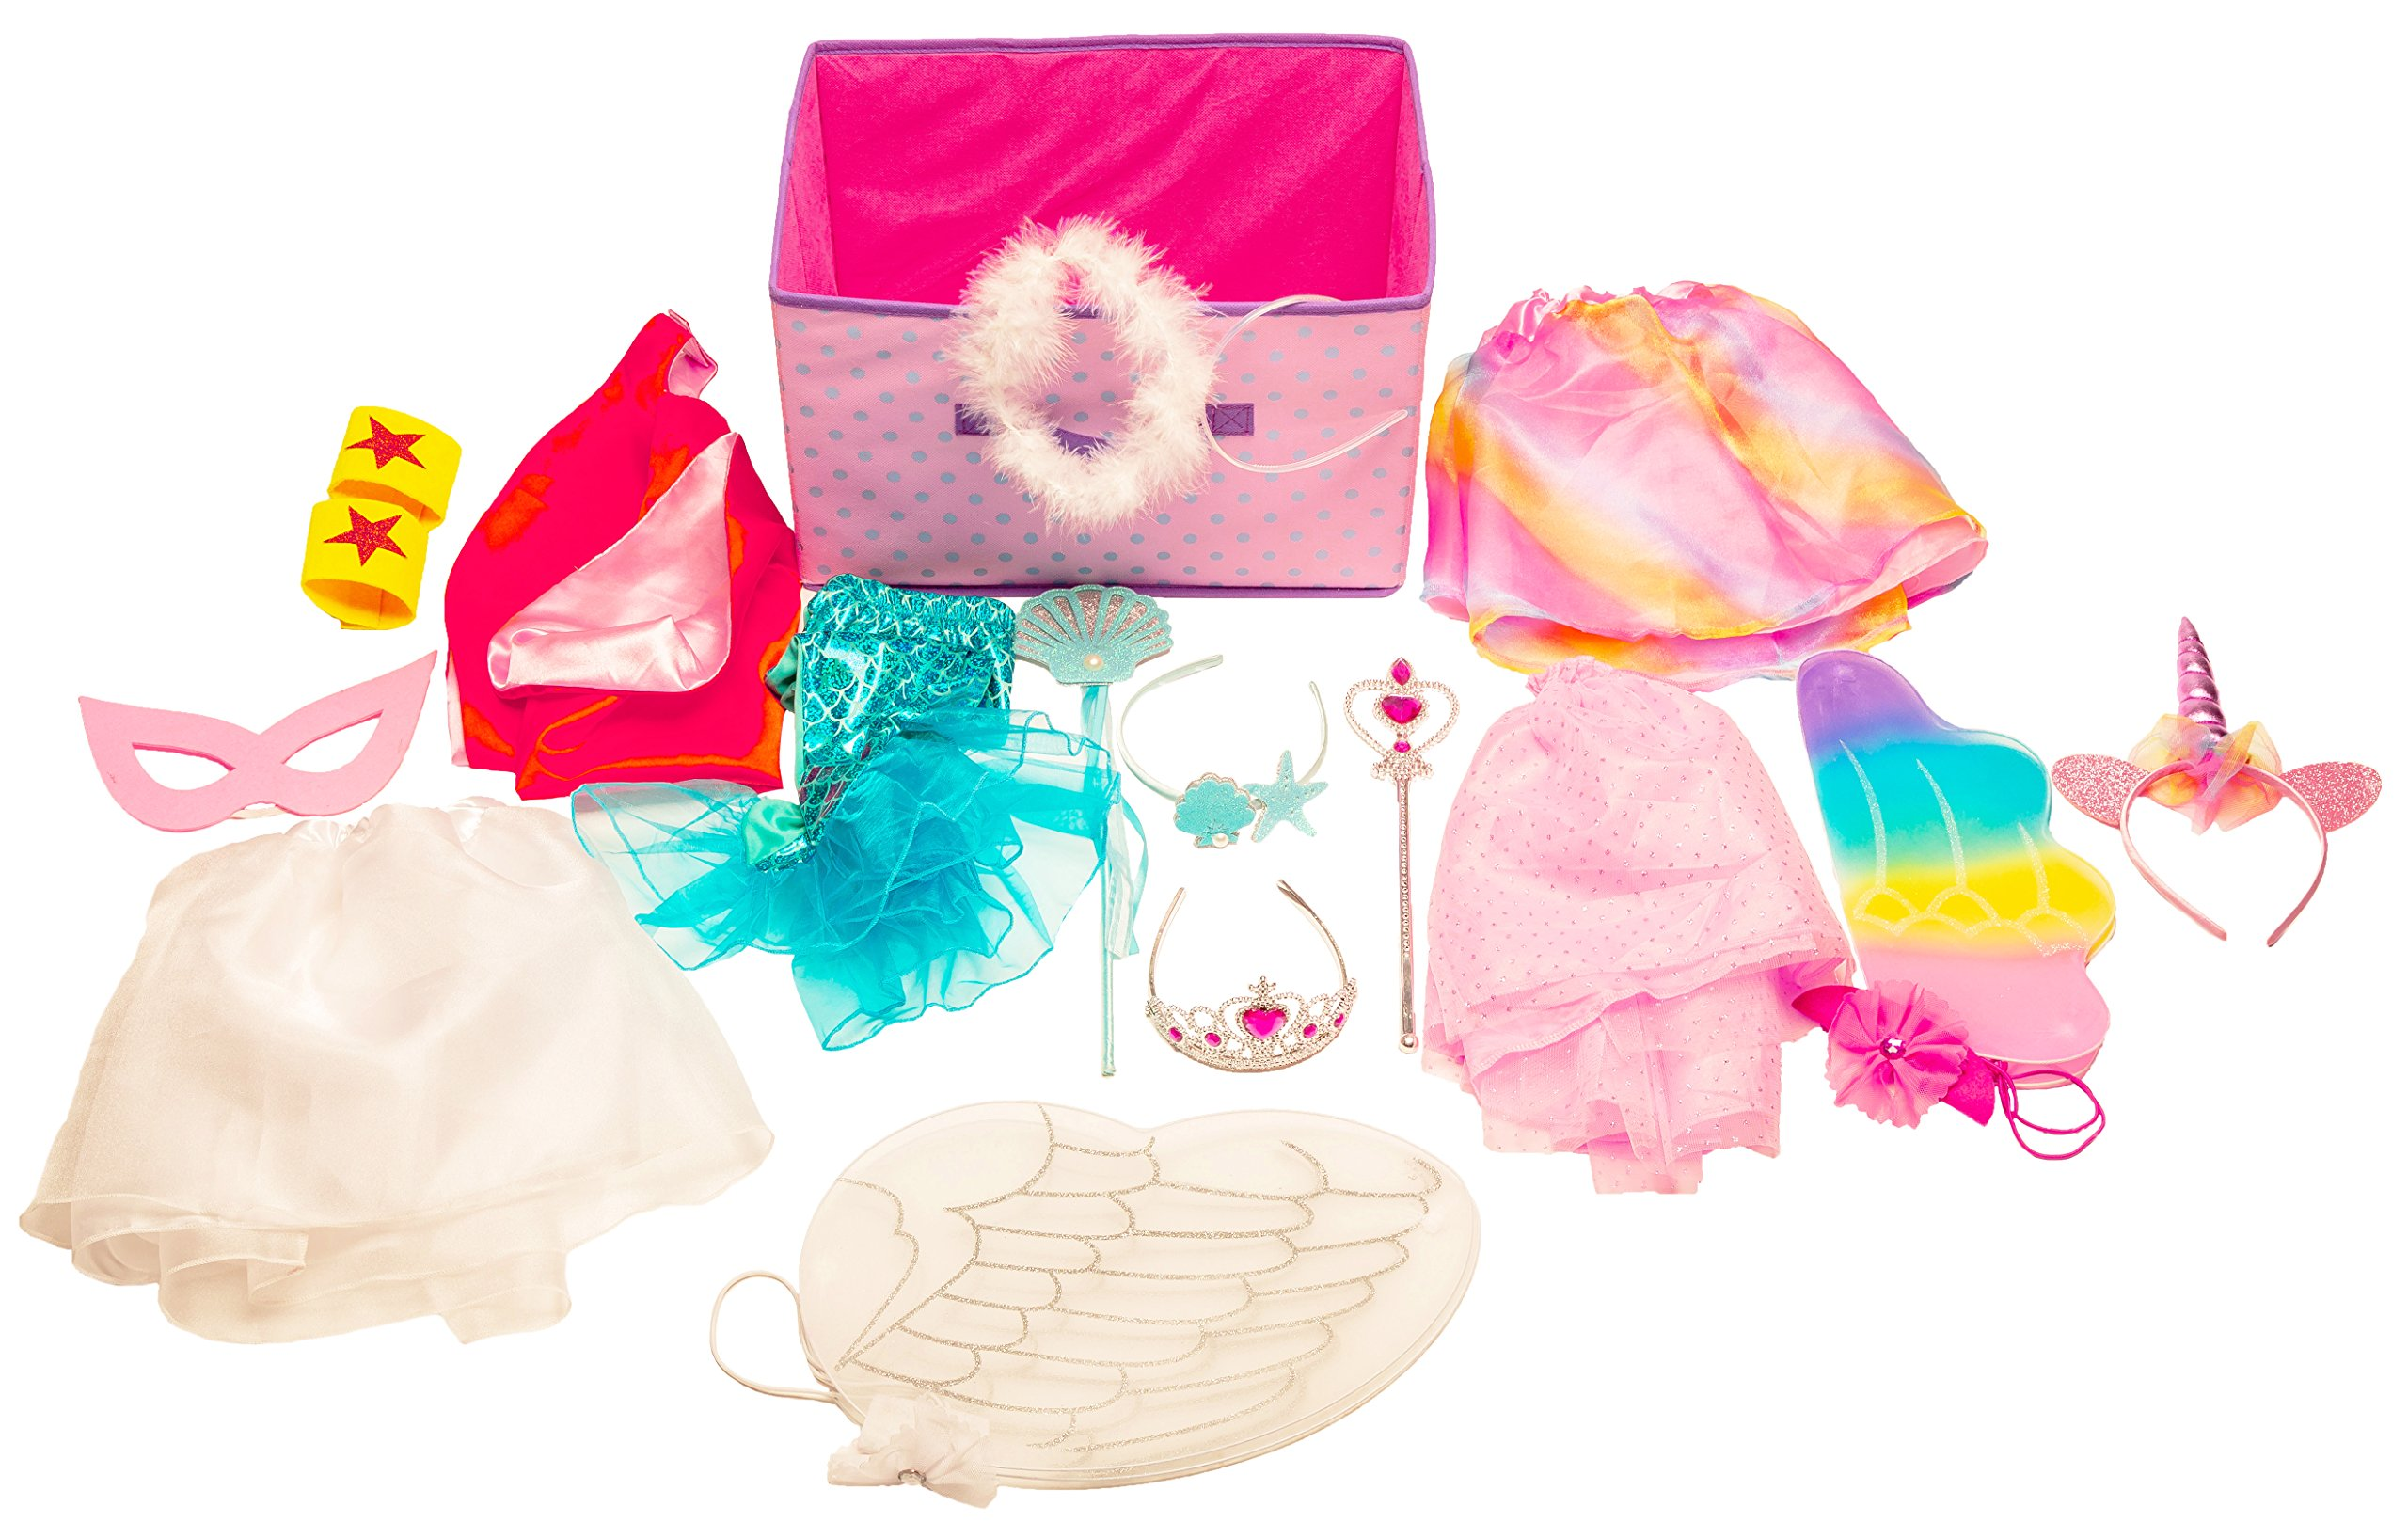 Girls Dress Up Set: Unicorn, Superhero, Angel, Mermaid, Princess - with Storage bin Pink by MMP Living (Image #2)